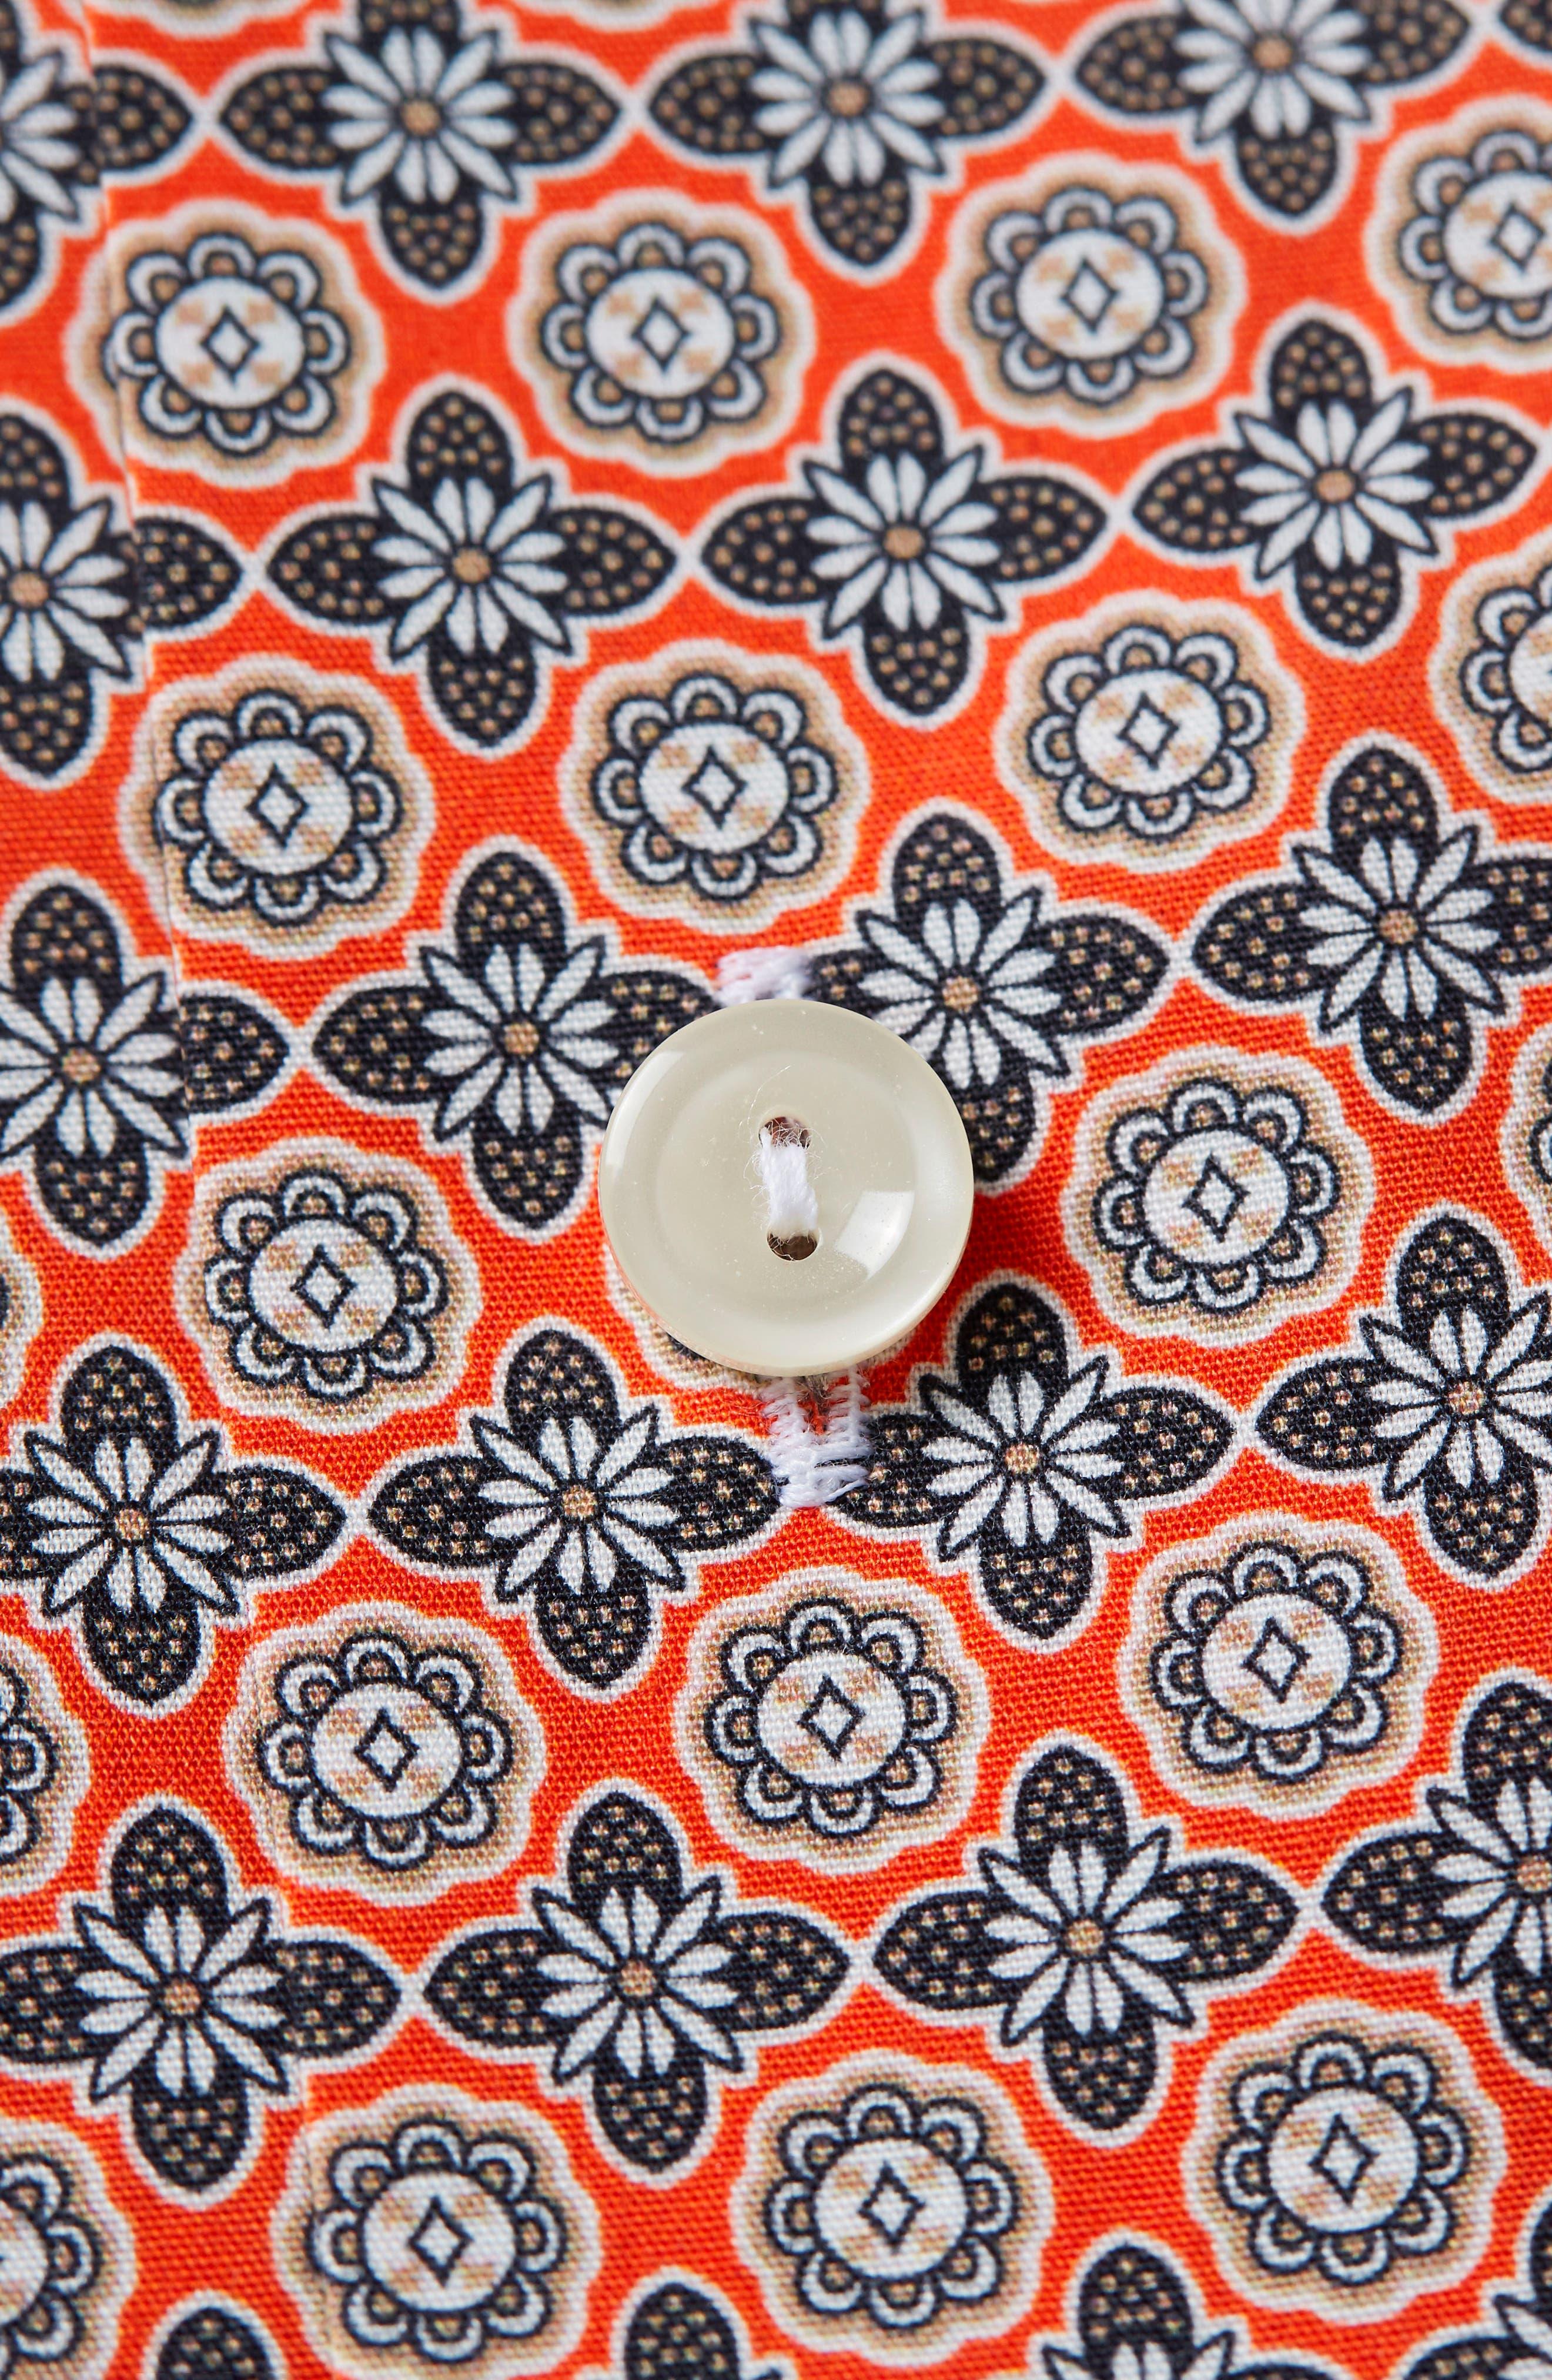 Slim Fit Floral Geometric Dress Shirt,                             Alternate thumbnail 3, color,                             Yellow/ Orange